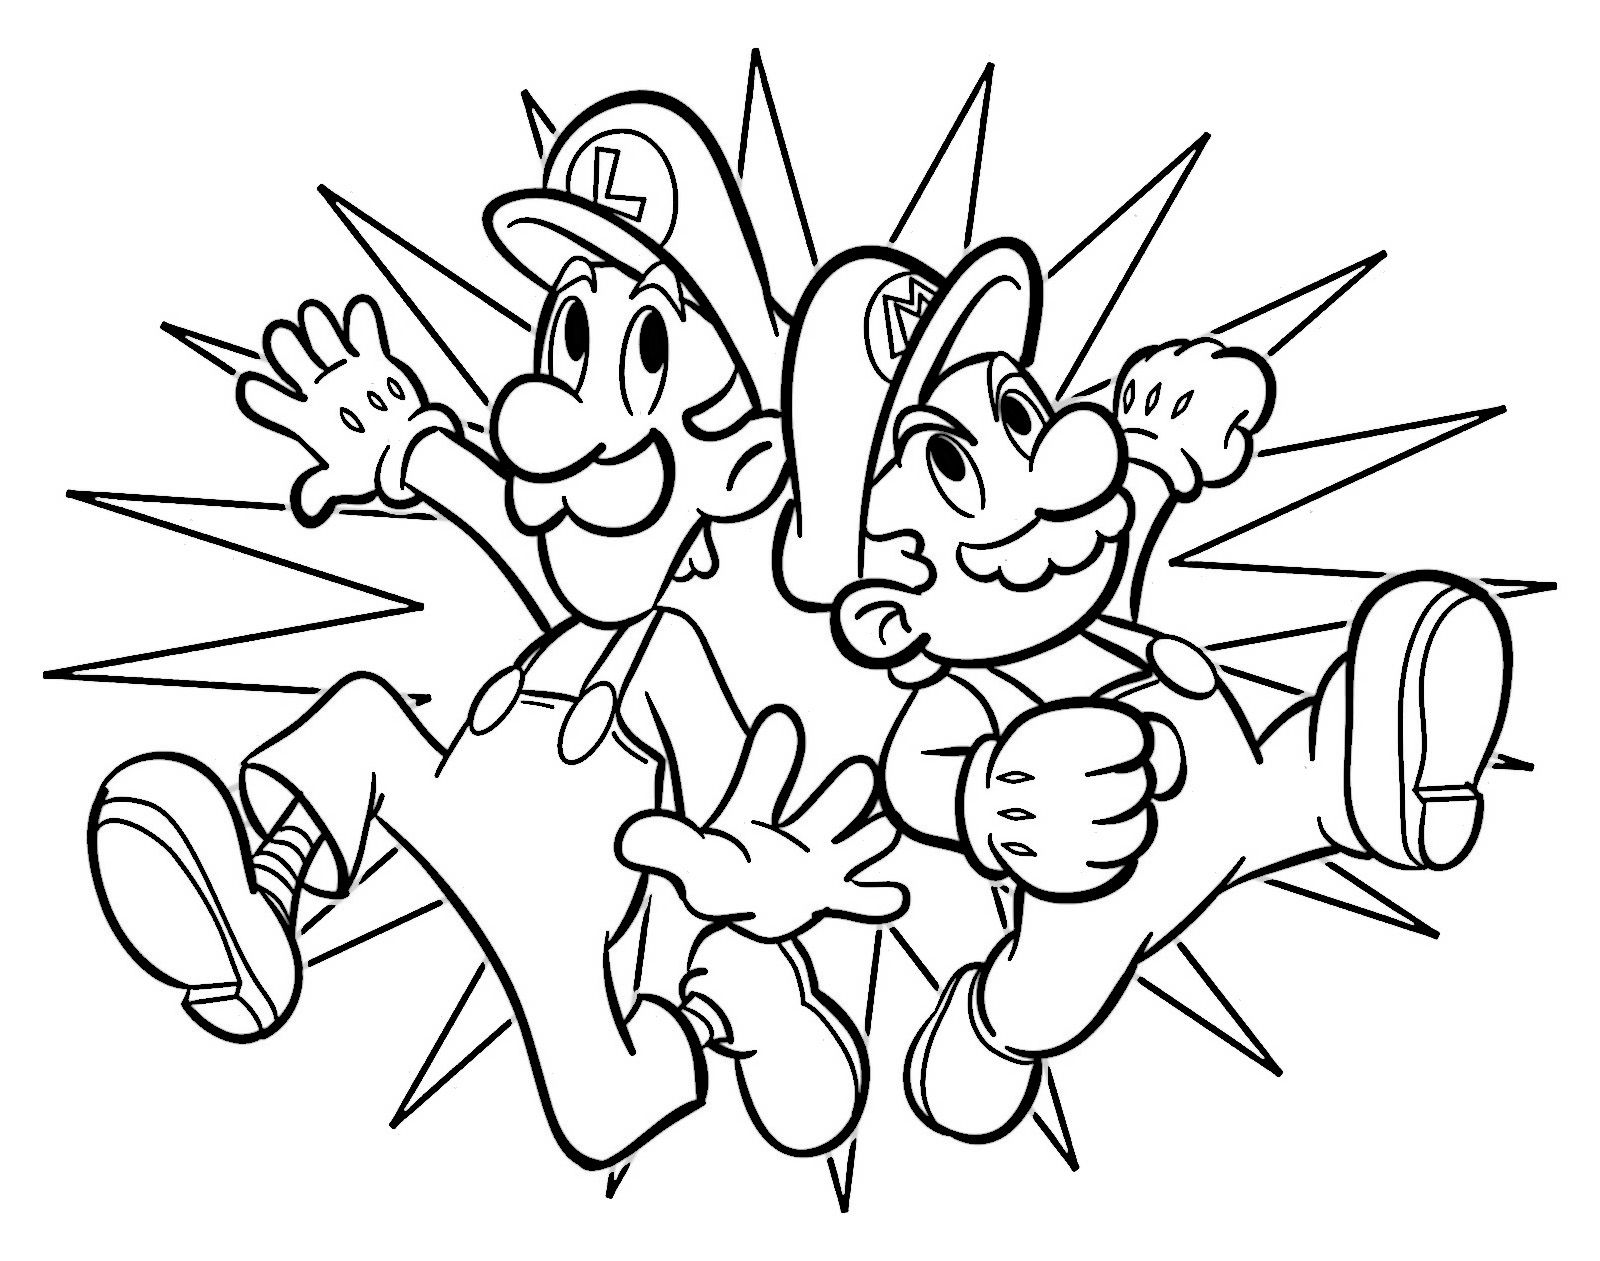 Dibujos para Colorear Mario Bross 4 | Dibujos para colorear para ...